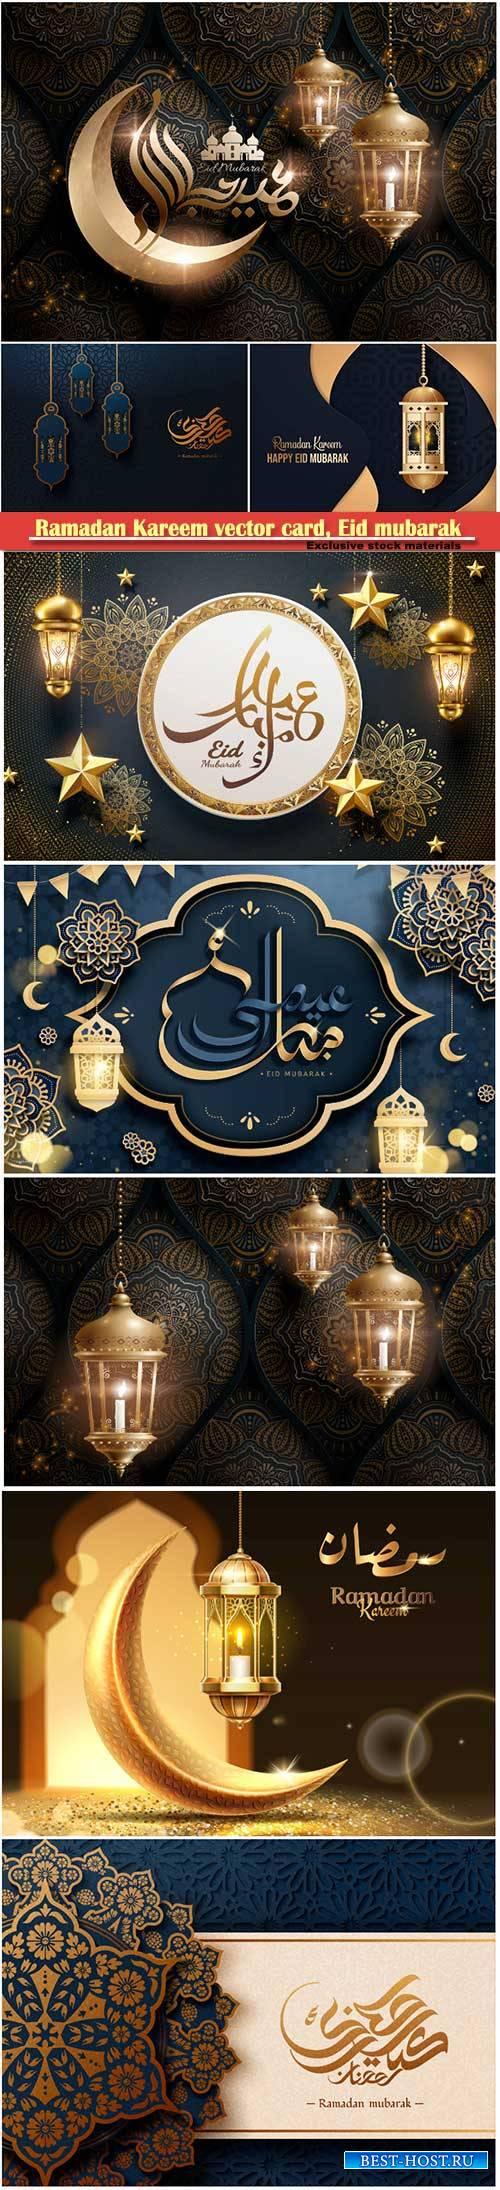 Ramadan Kareem vector card, Eid mubarak calligraphy design templates # 25